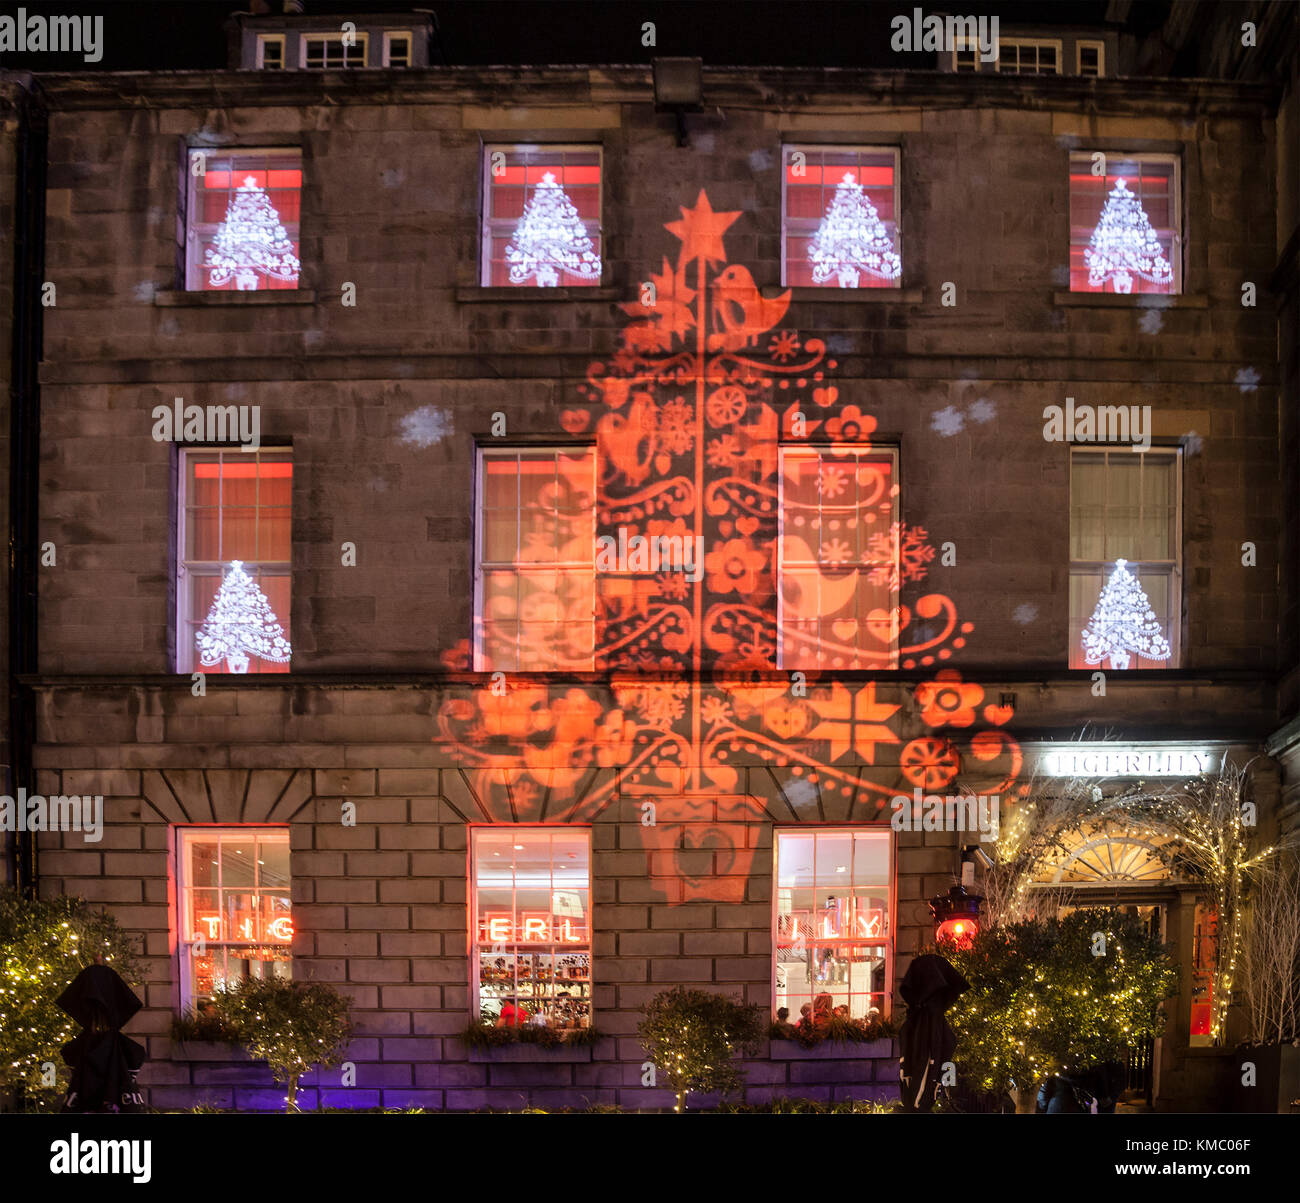 Light Shop In Edinburgh: Edinburgh Christmas Tree Stock Photos & Edinburgh